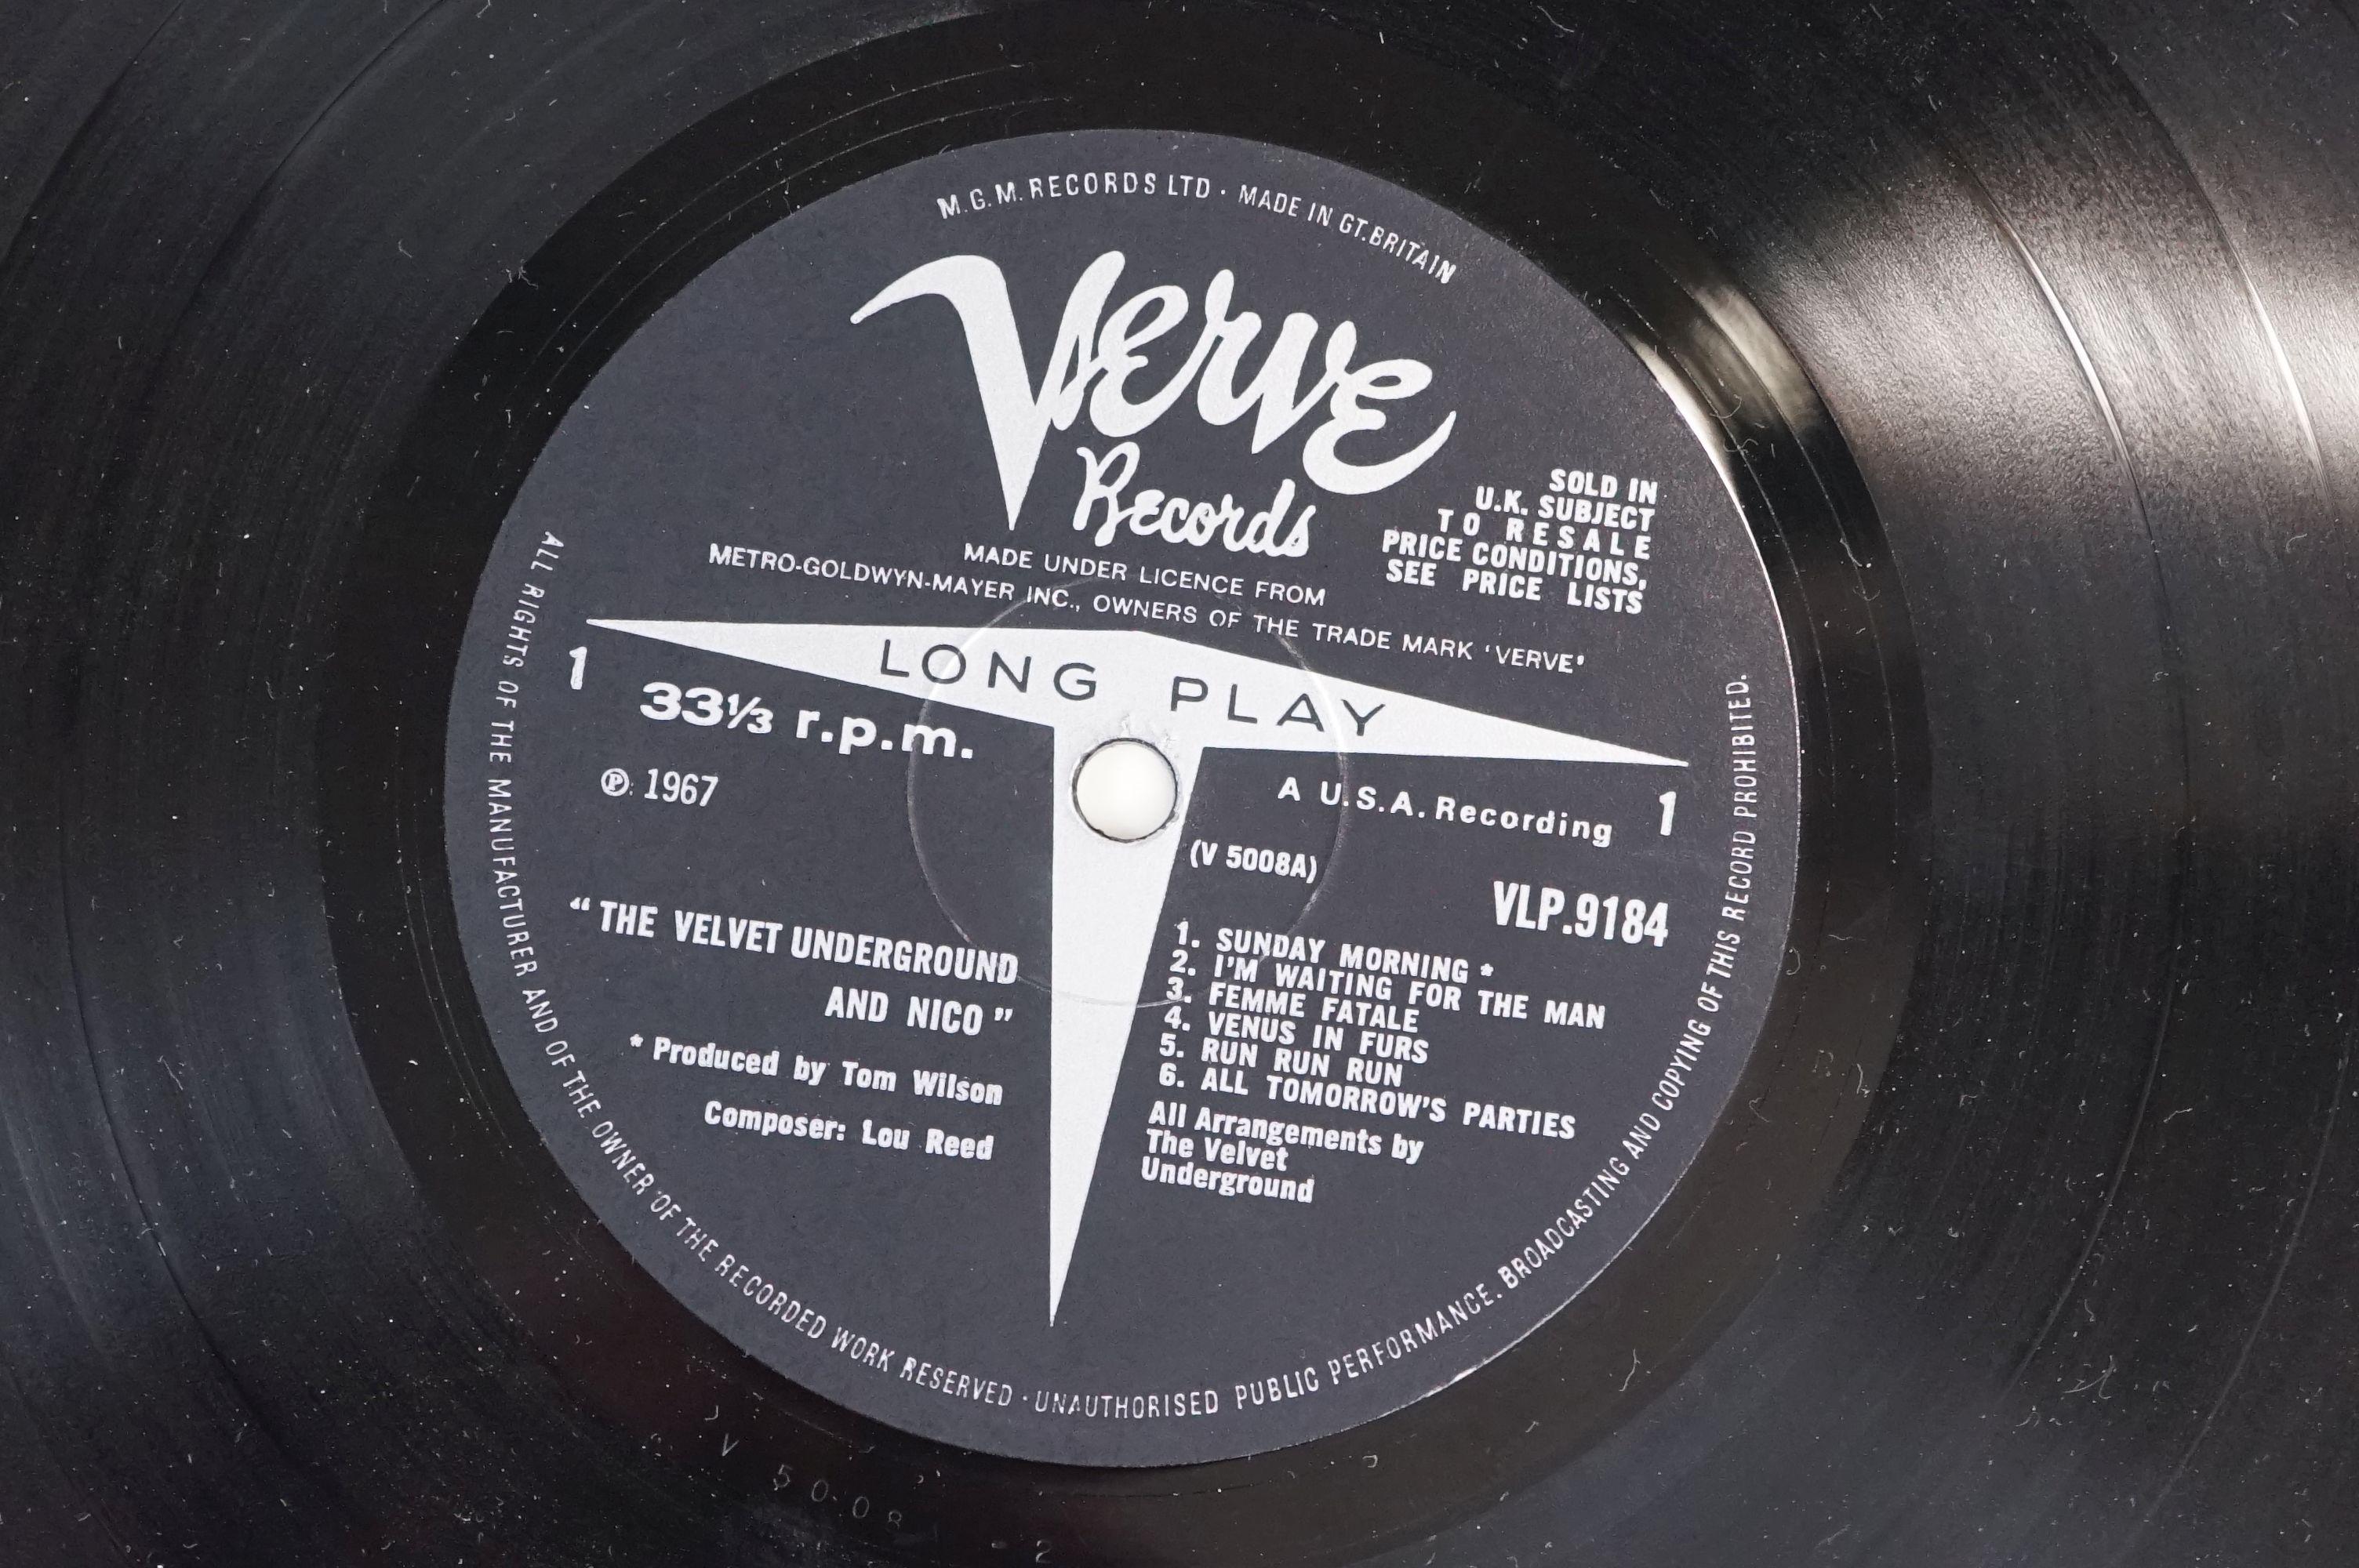 Vinyl - The Velvet Underground & Nico produced by Andy Warhol LP on Verve VLP9184 mono, non banana - Image 3 of 5